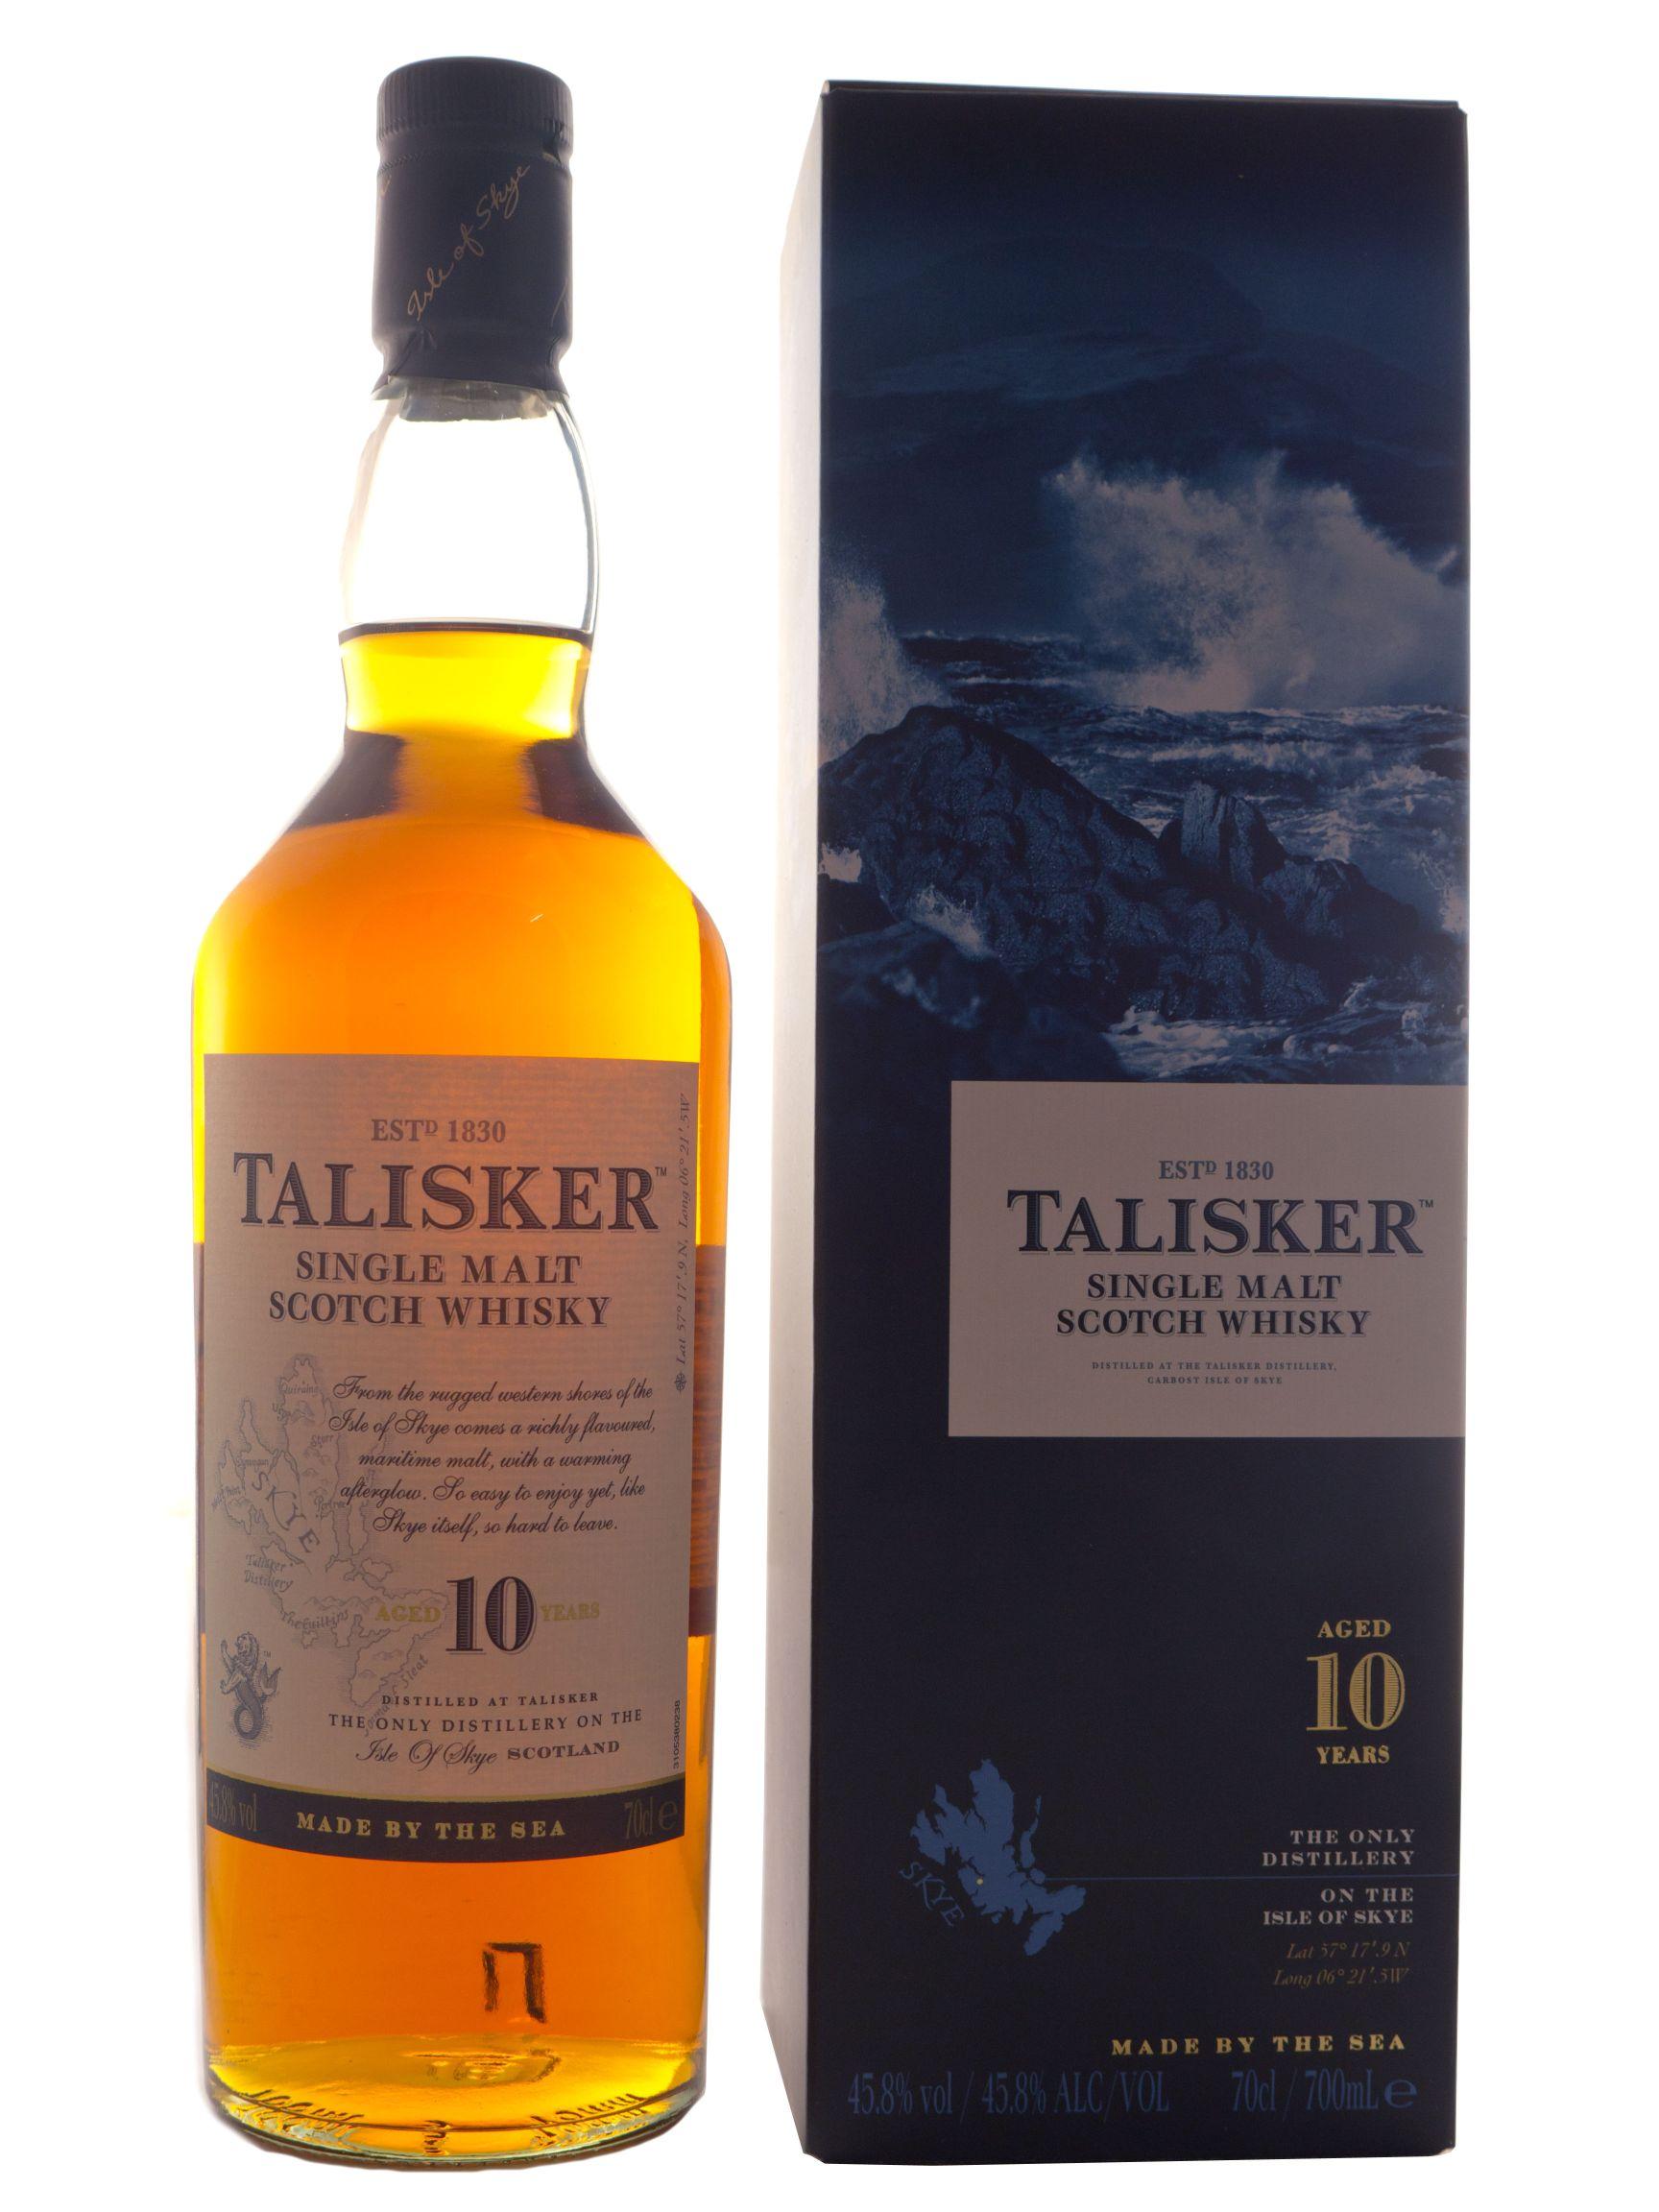 talisker 10 jahre single malt scotch whisky kaufen ab 30 99 eur im single malt scotch whisky. Black Bedroom Furniture Sets. Home Design Ideas